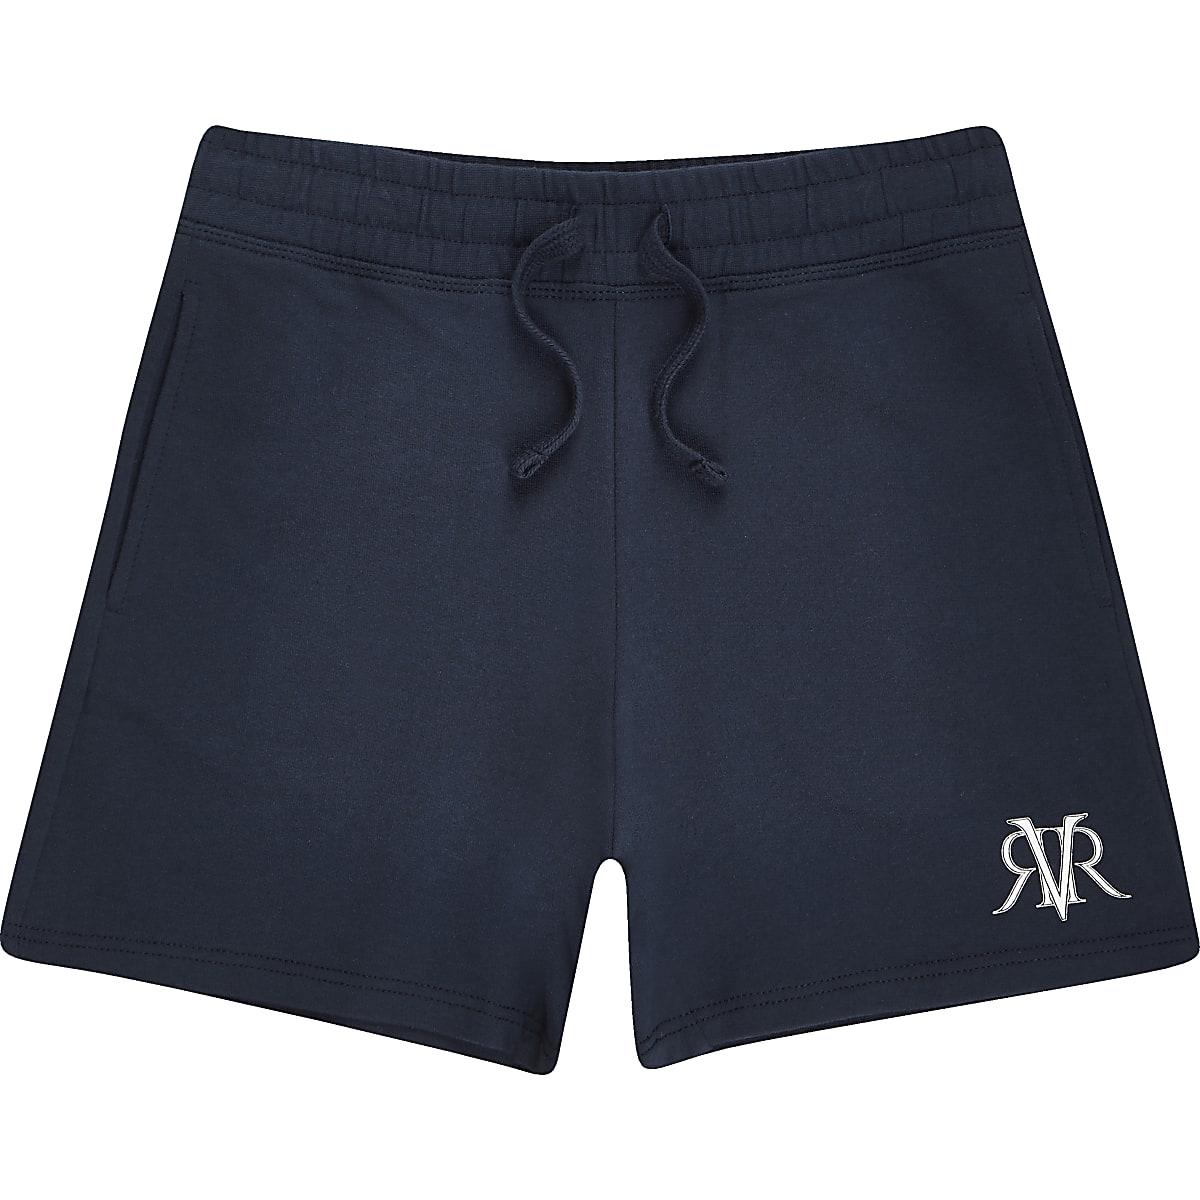 Mini boys navy 'RVR' print shorts